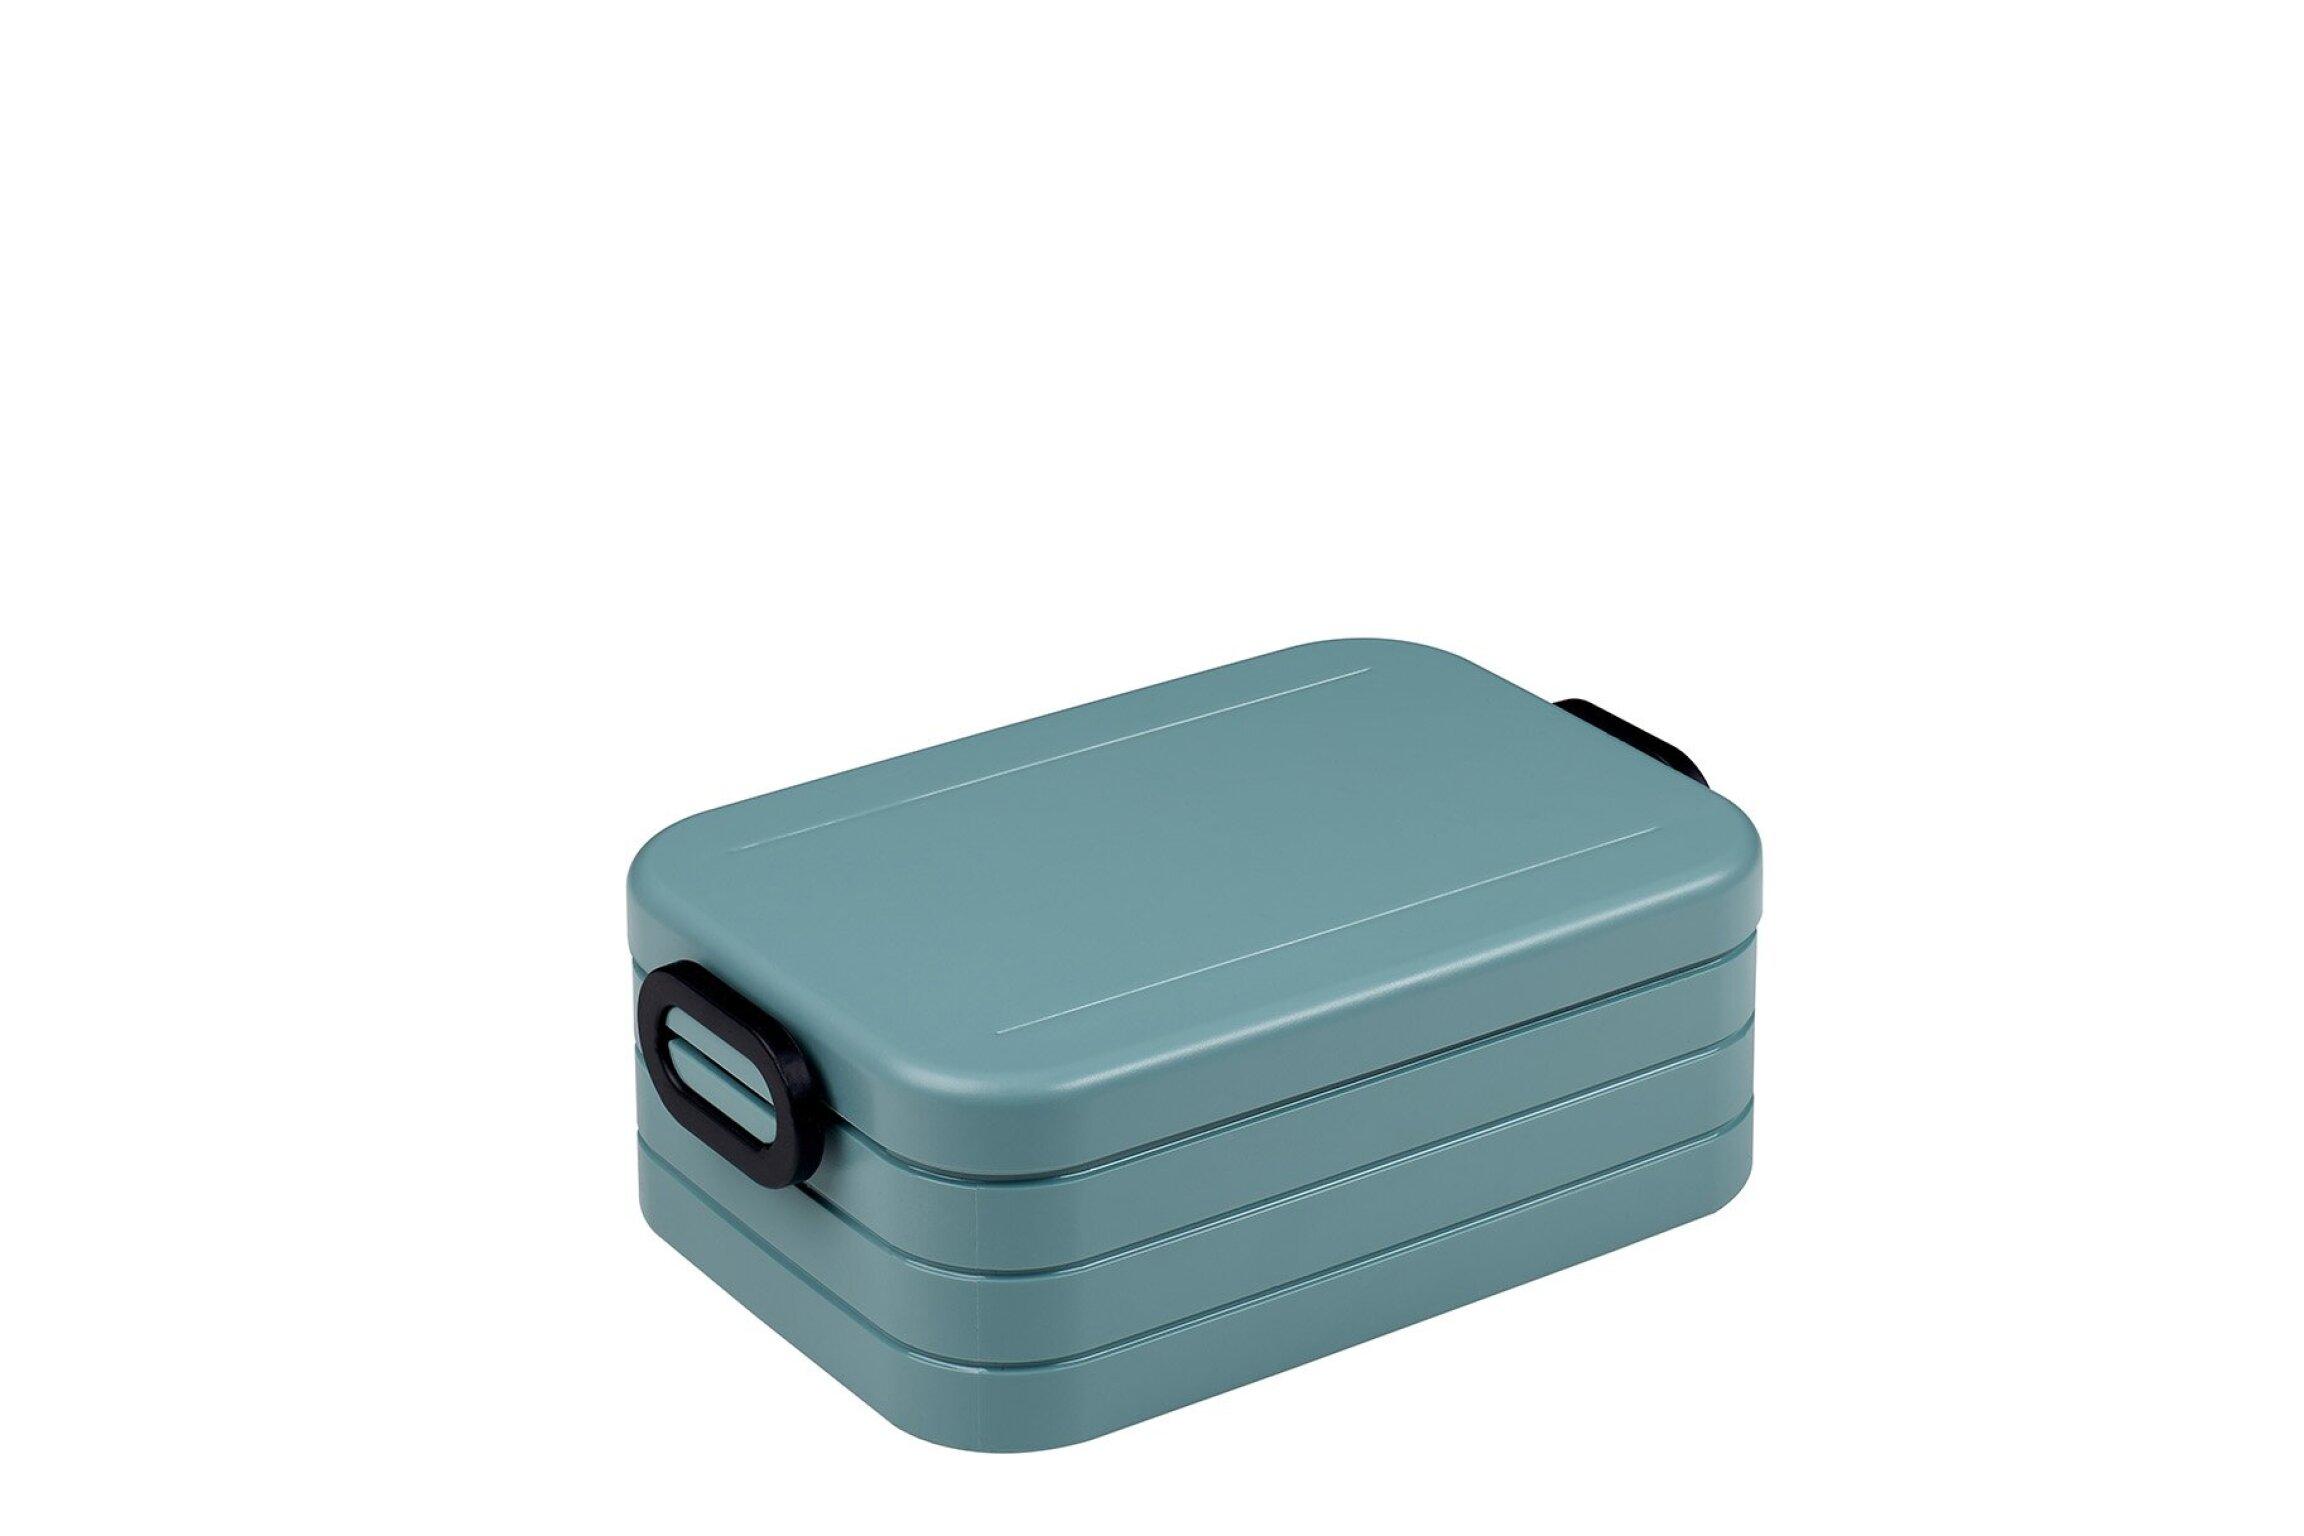 MEPAL Lunchset Unterwegs (Lunchbox + Trinkflasche) - Nordic green